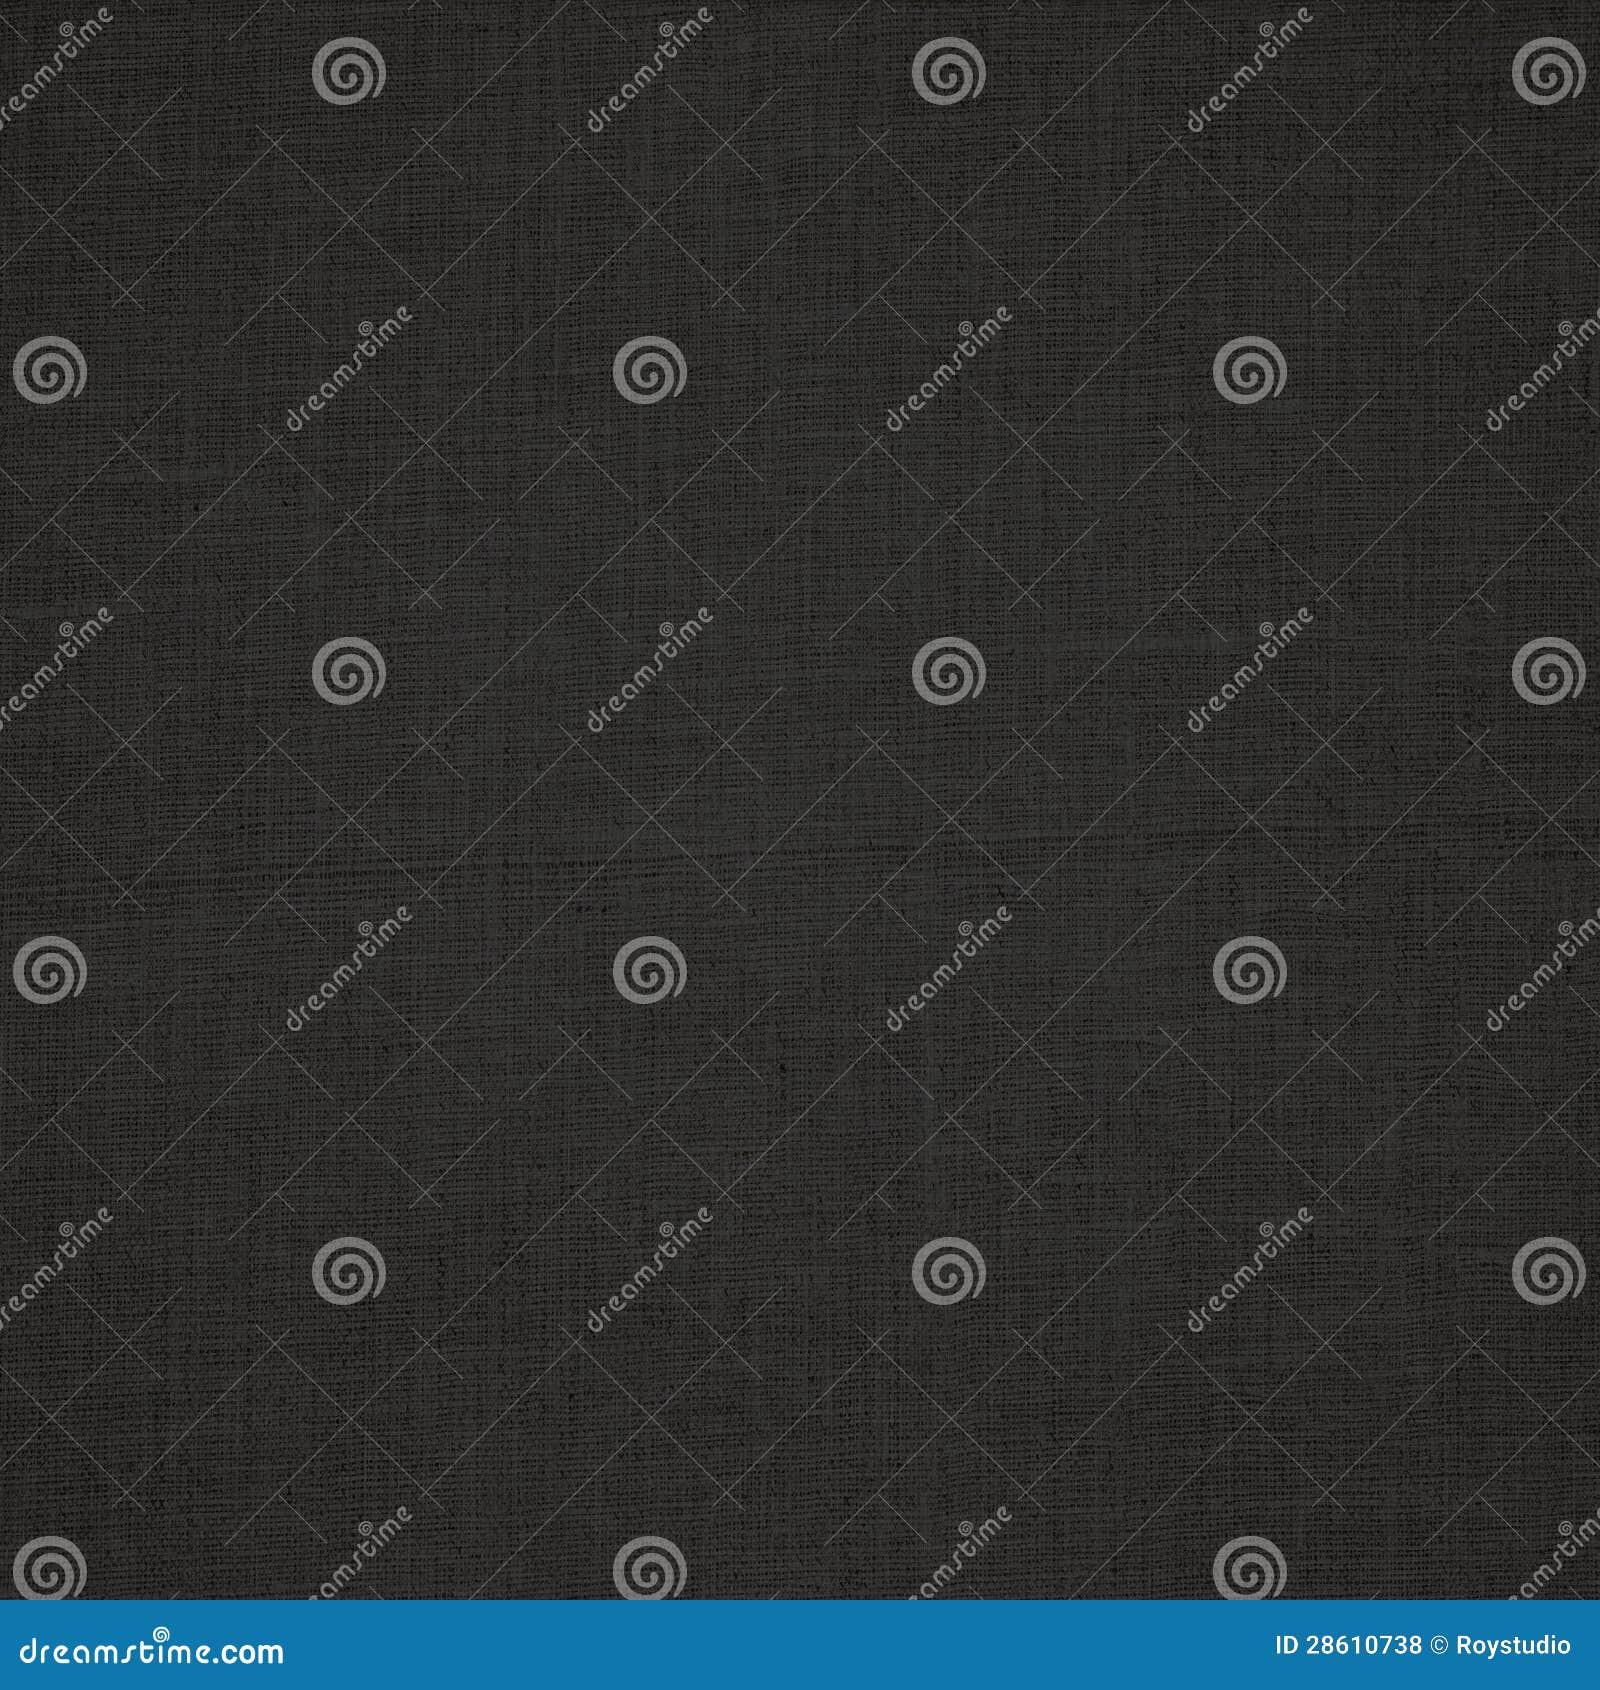 Black Canvas Background : Black canvas background fabric texture pattern stock photo